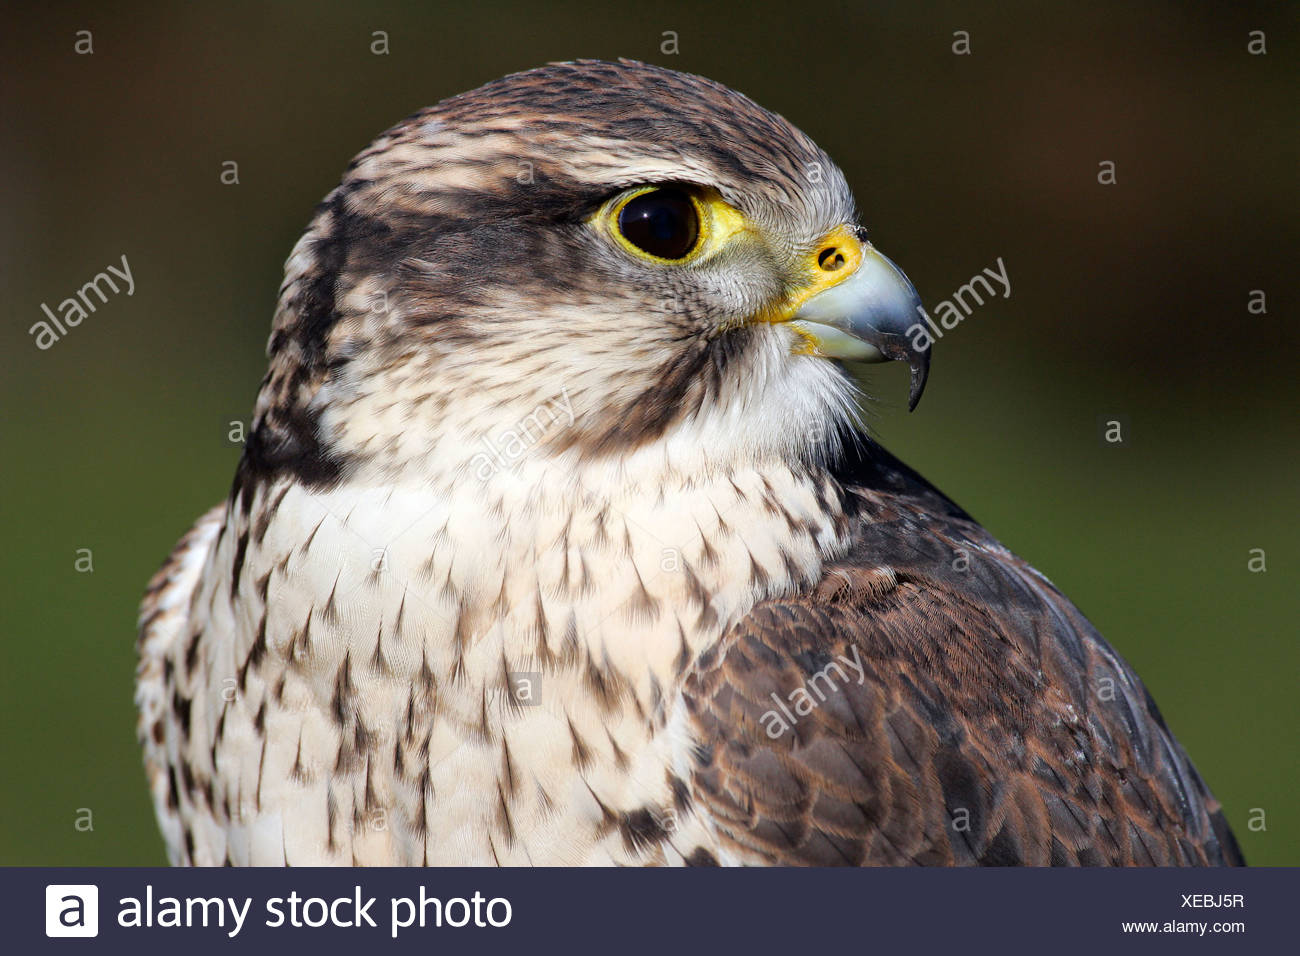 Saker falcon - portrait (Falco cherrug) - Stock Image